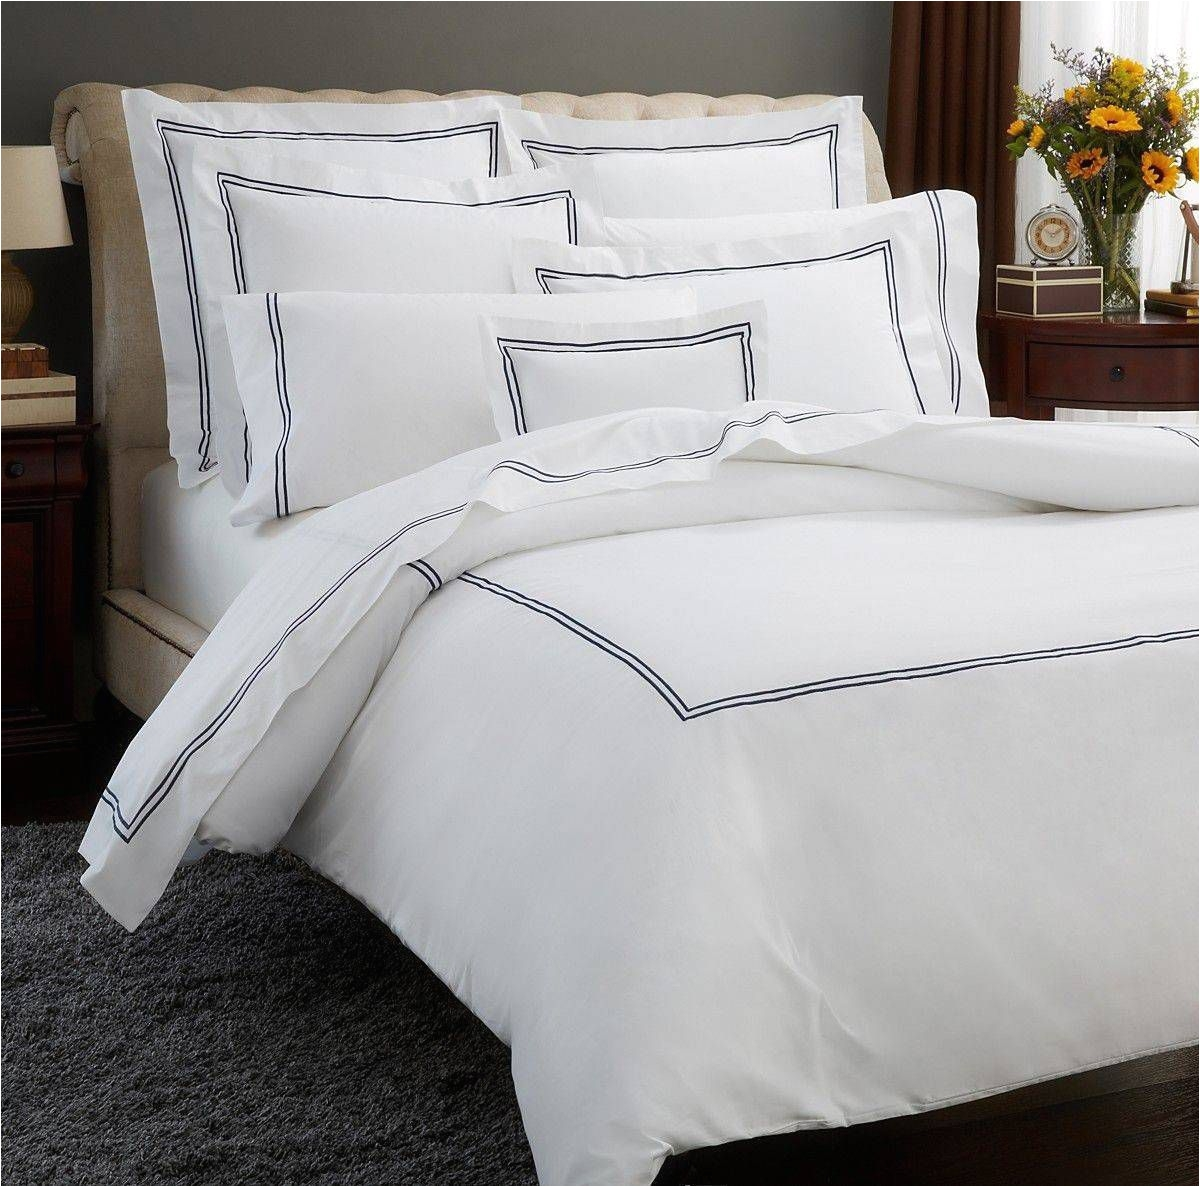 little girl bedroom sets beautiful bedroom ideas bed linen luxury bloomingdales mattresses 0d 5b0db03d3037130037101ba5